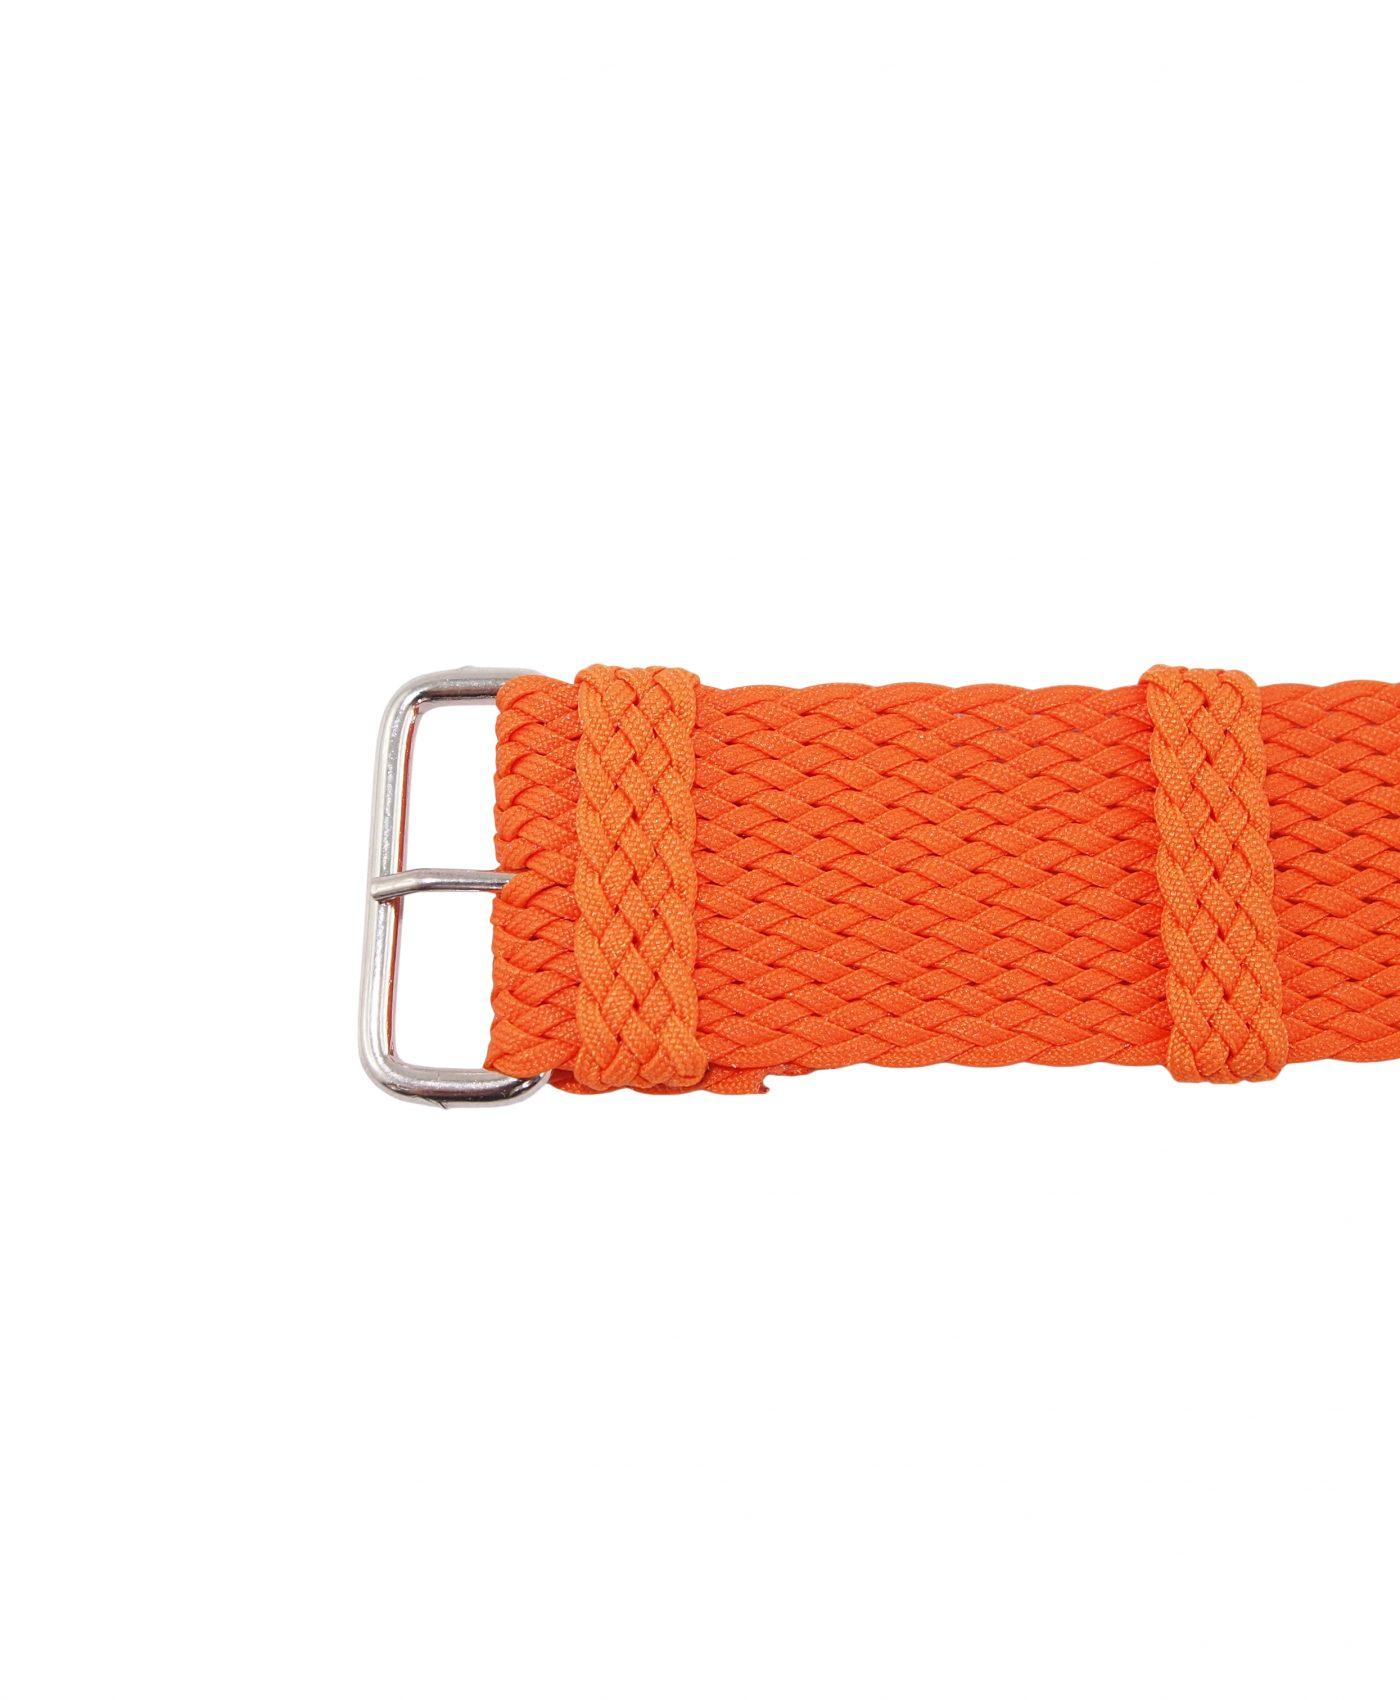 Perlon Strap   Orange   22mm